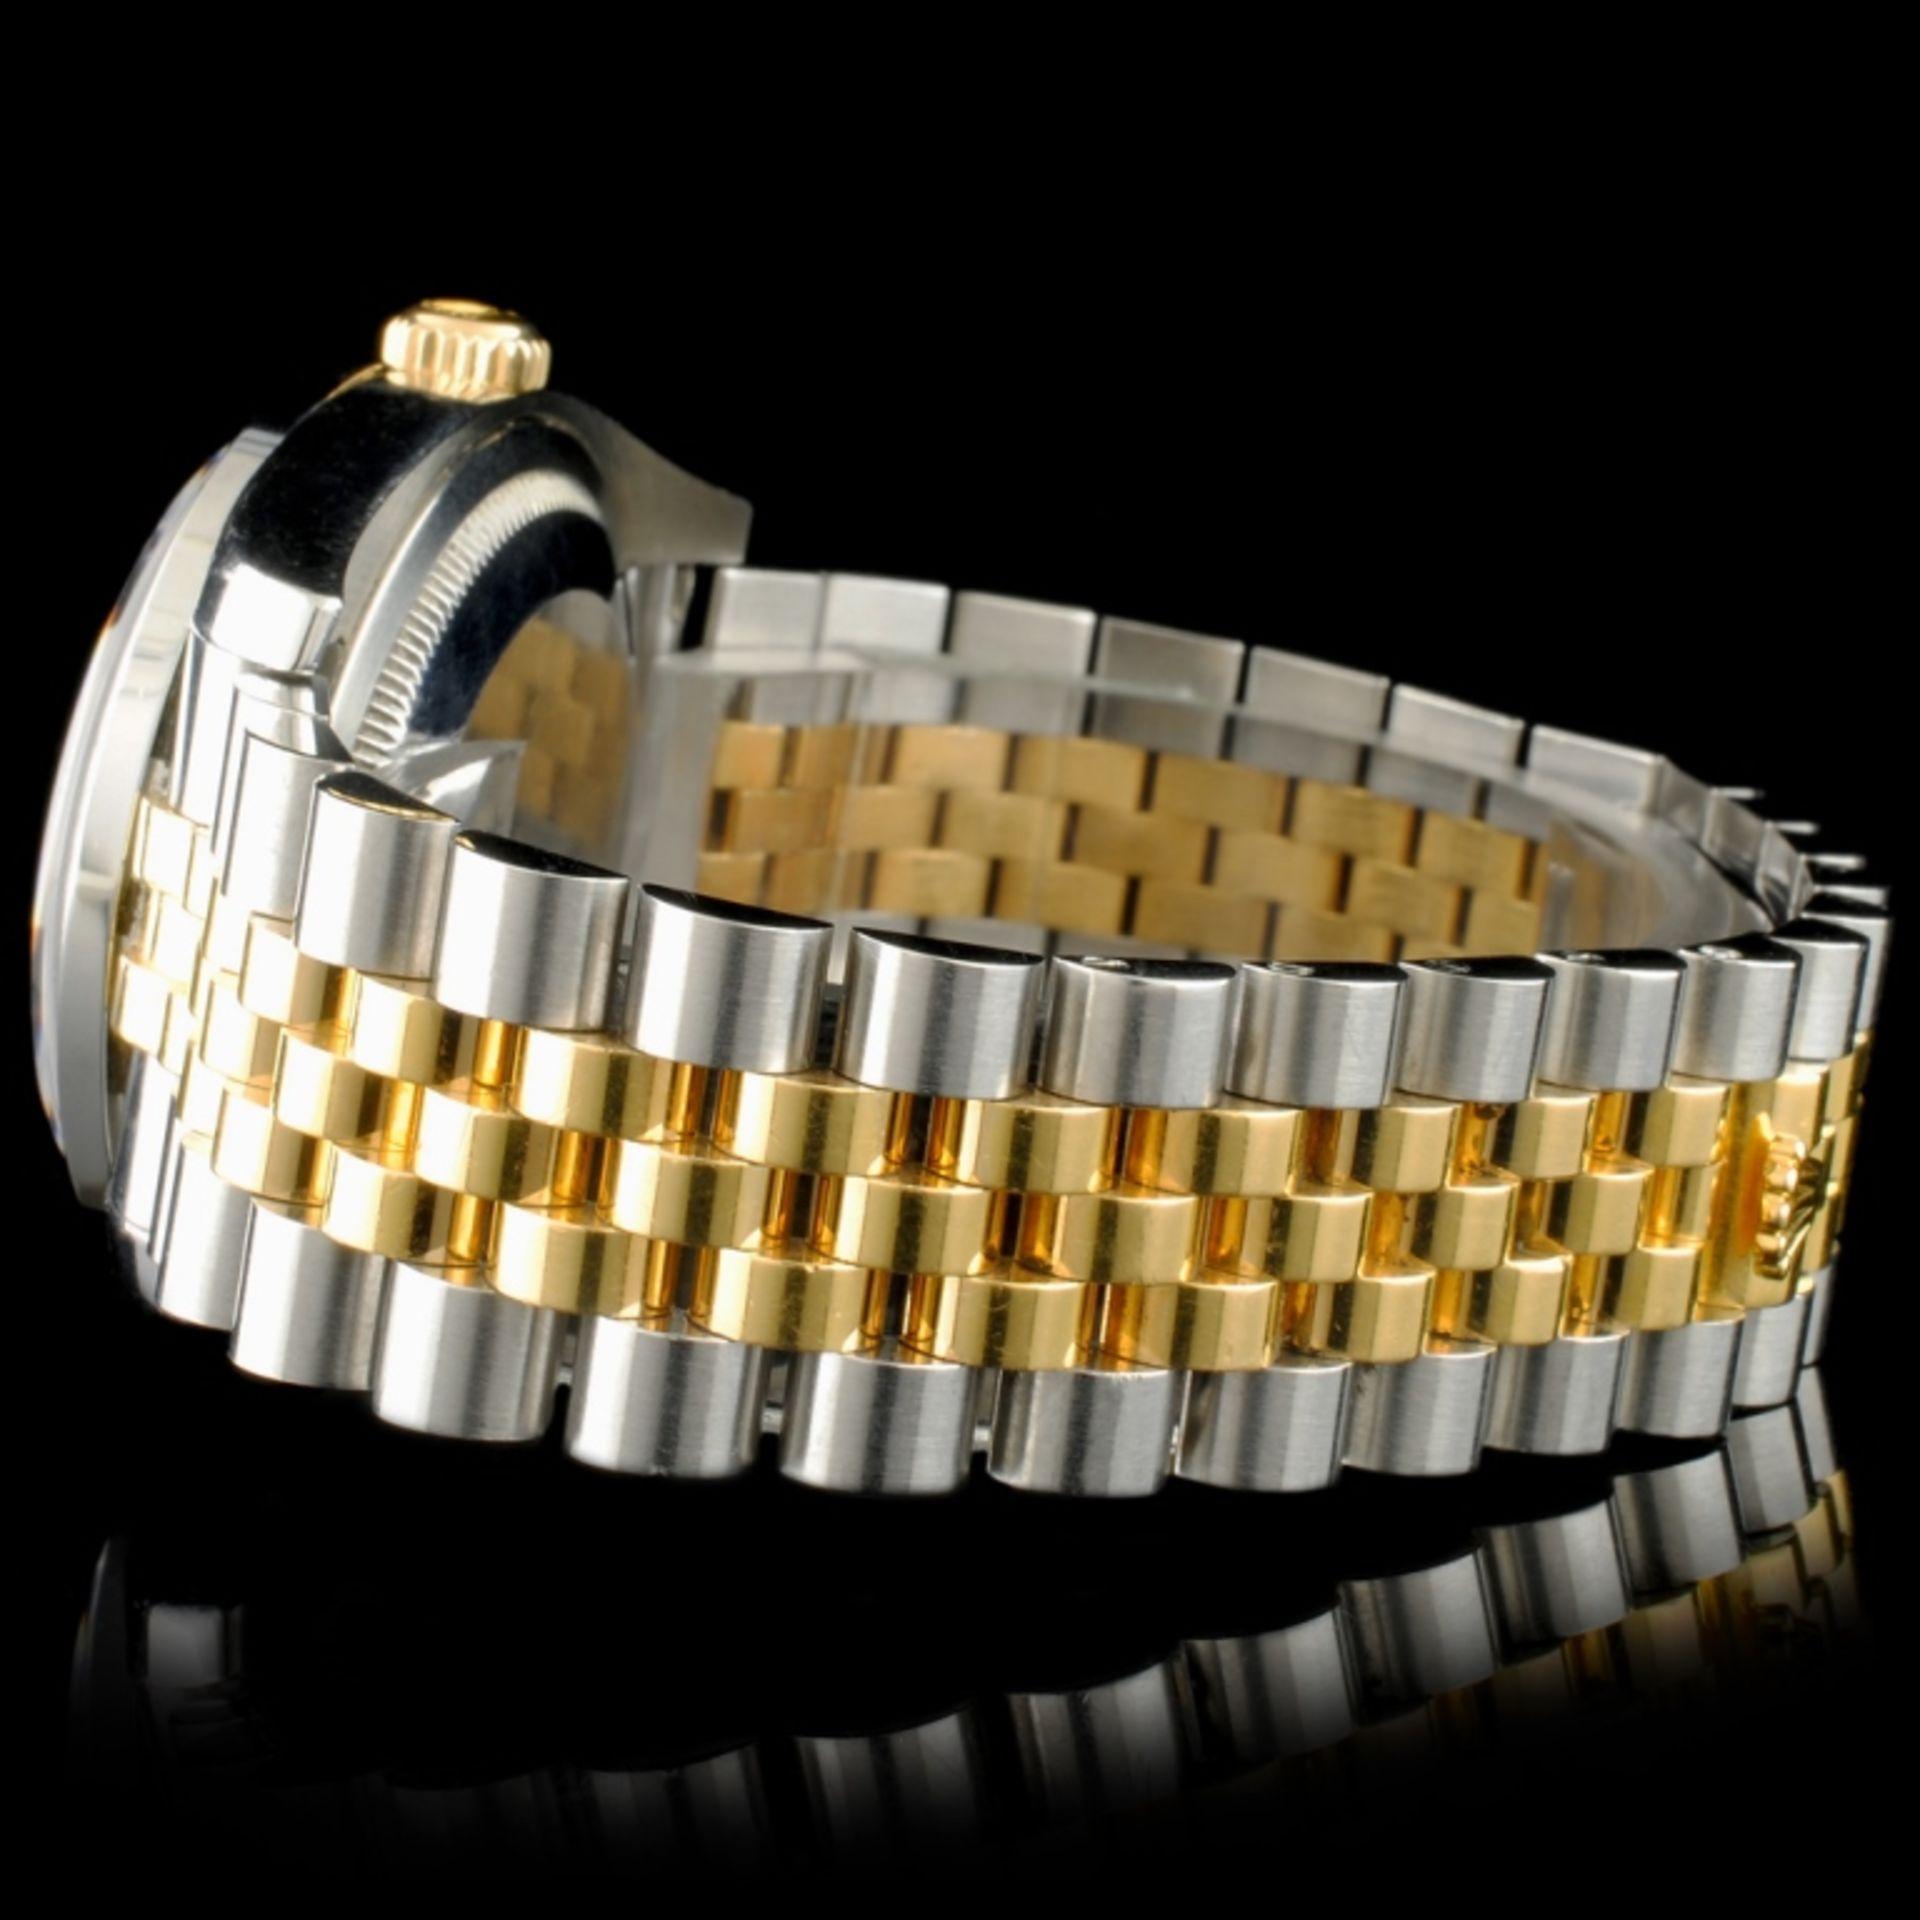 Rolex DateJust 116233 18K YG/SS Diamond 36MM Watch - Image 5 of 7